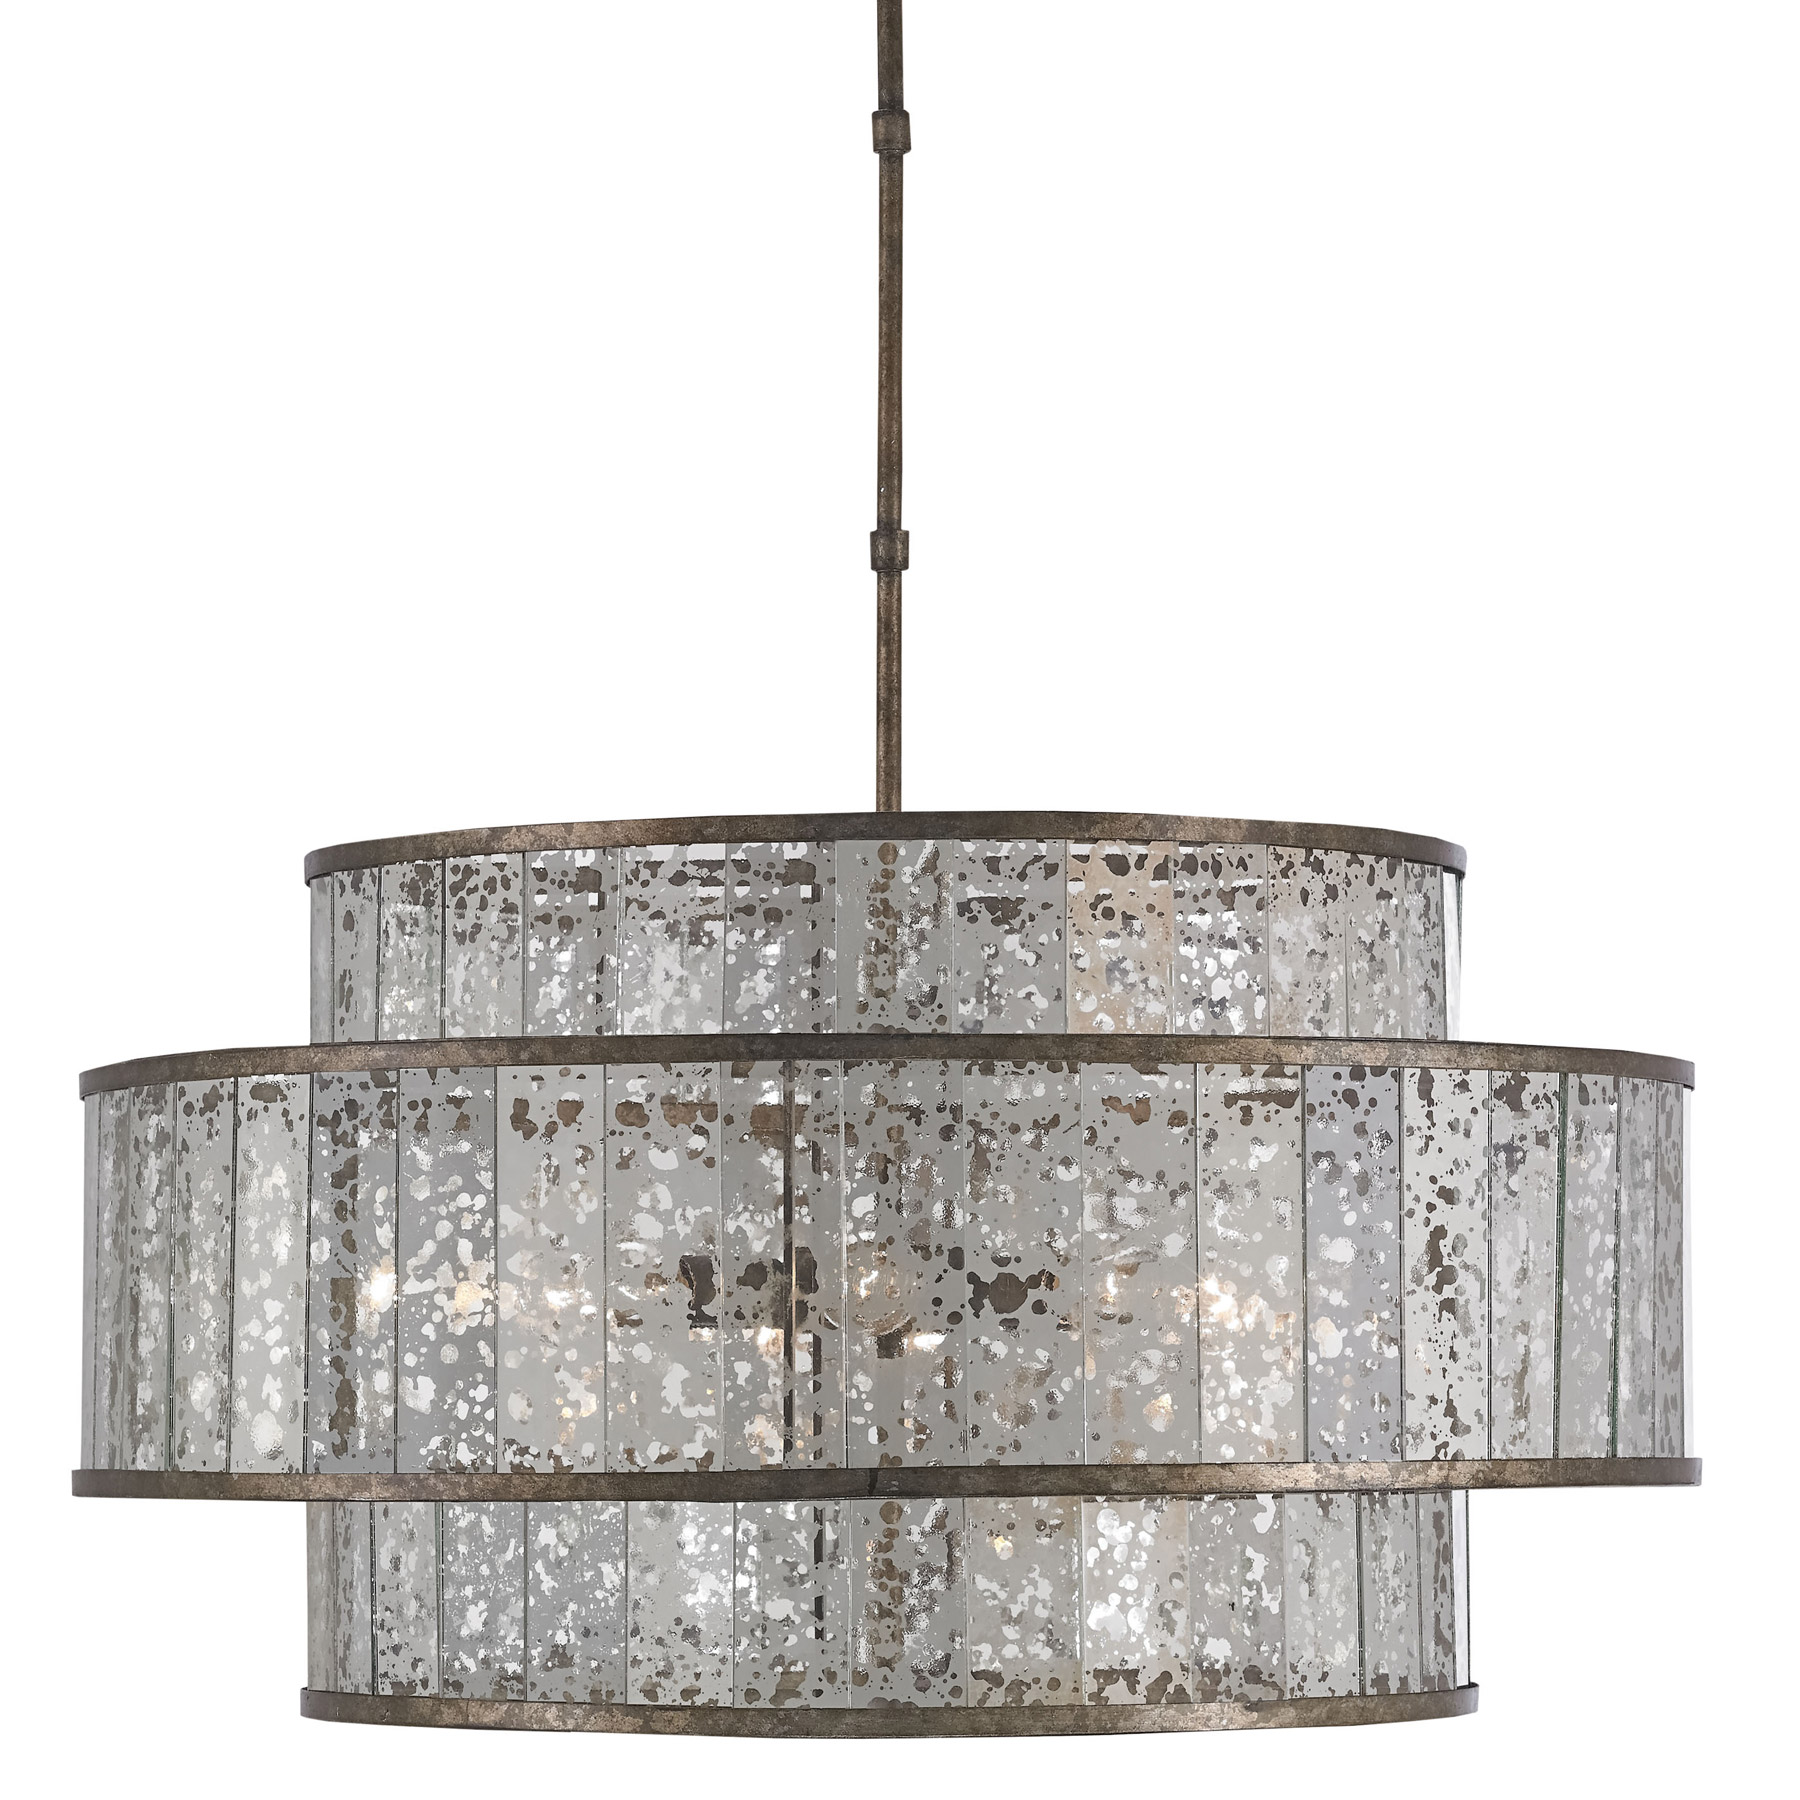 Currey and company 9454 fantine chandelier pendant aloadofball Choice Image